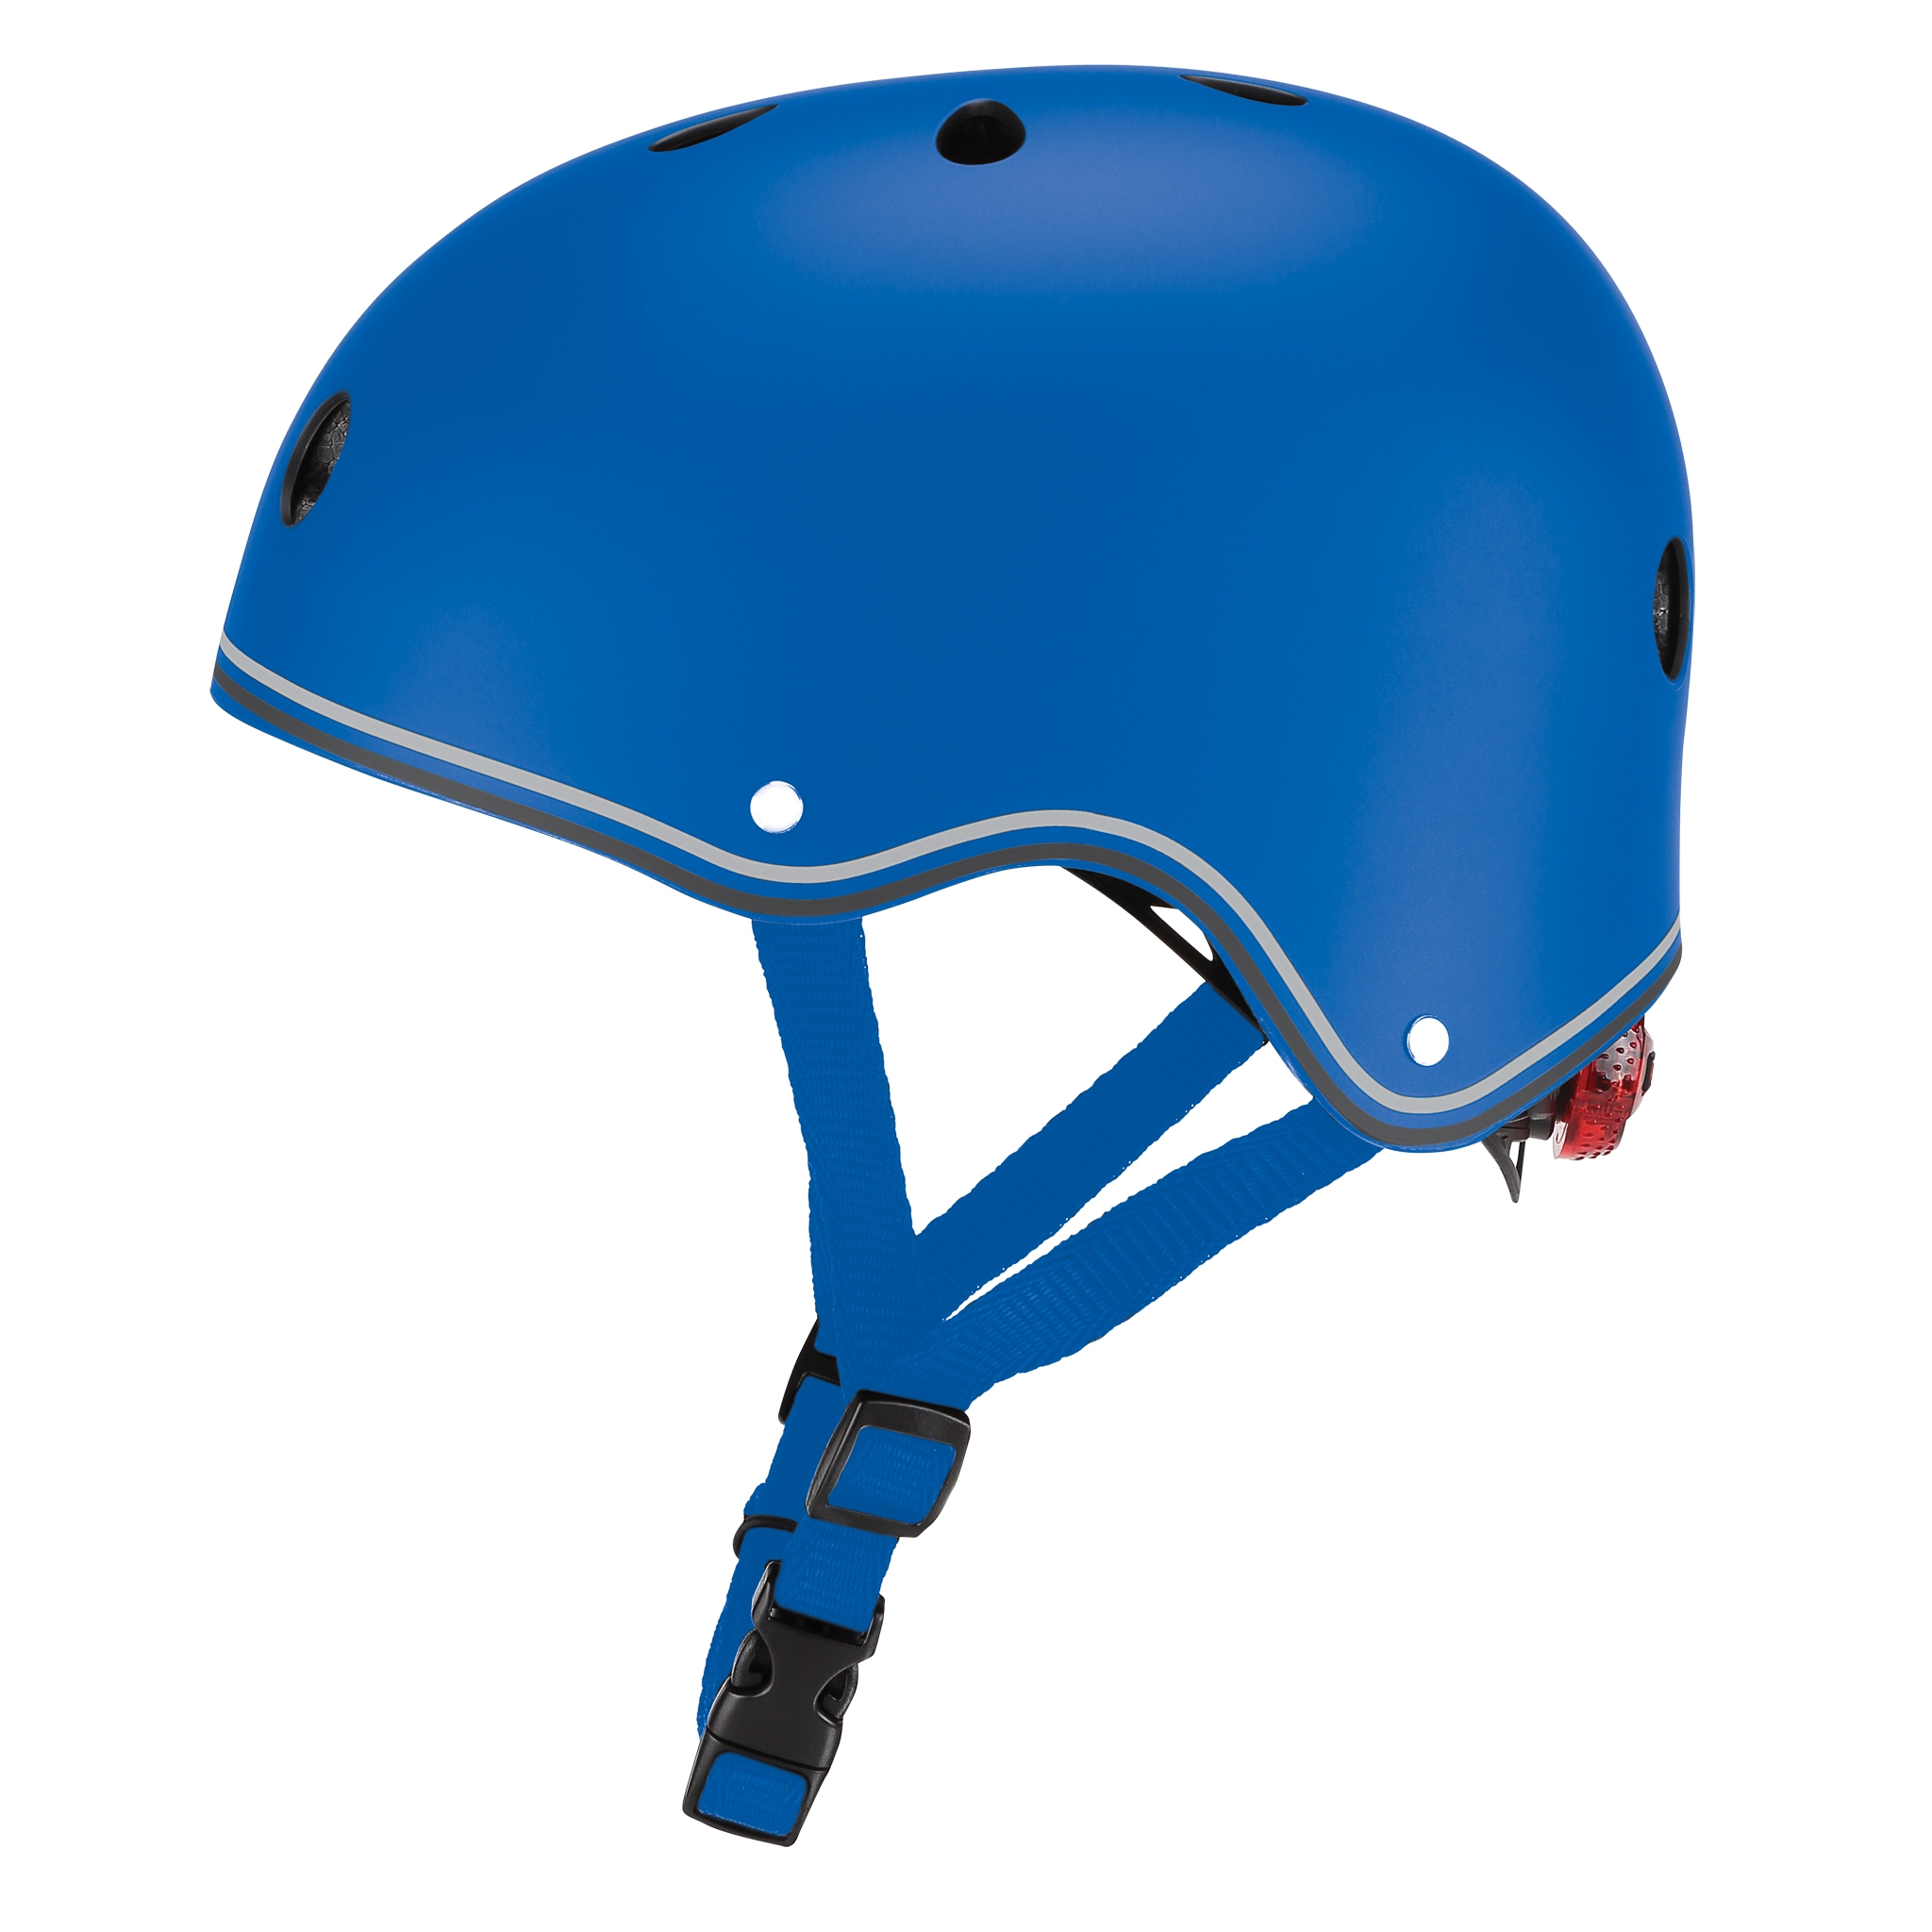 PRIMO-helmets-scooter-helmets-for-kids-with-adjustable-helmet-knob-navy-blue 1